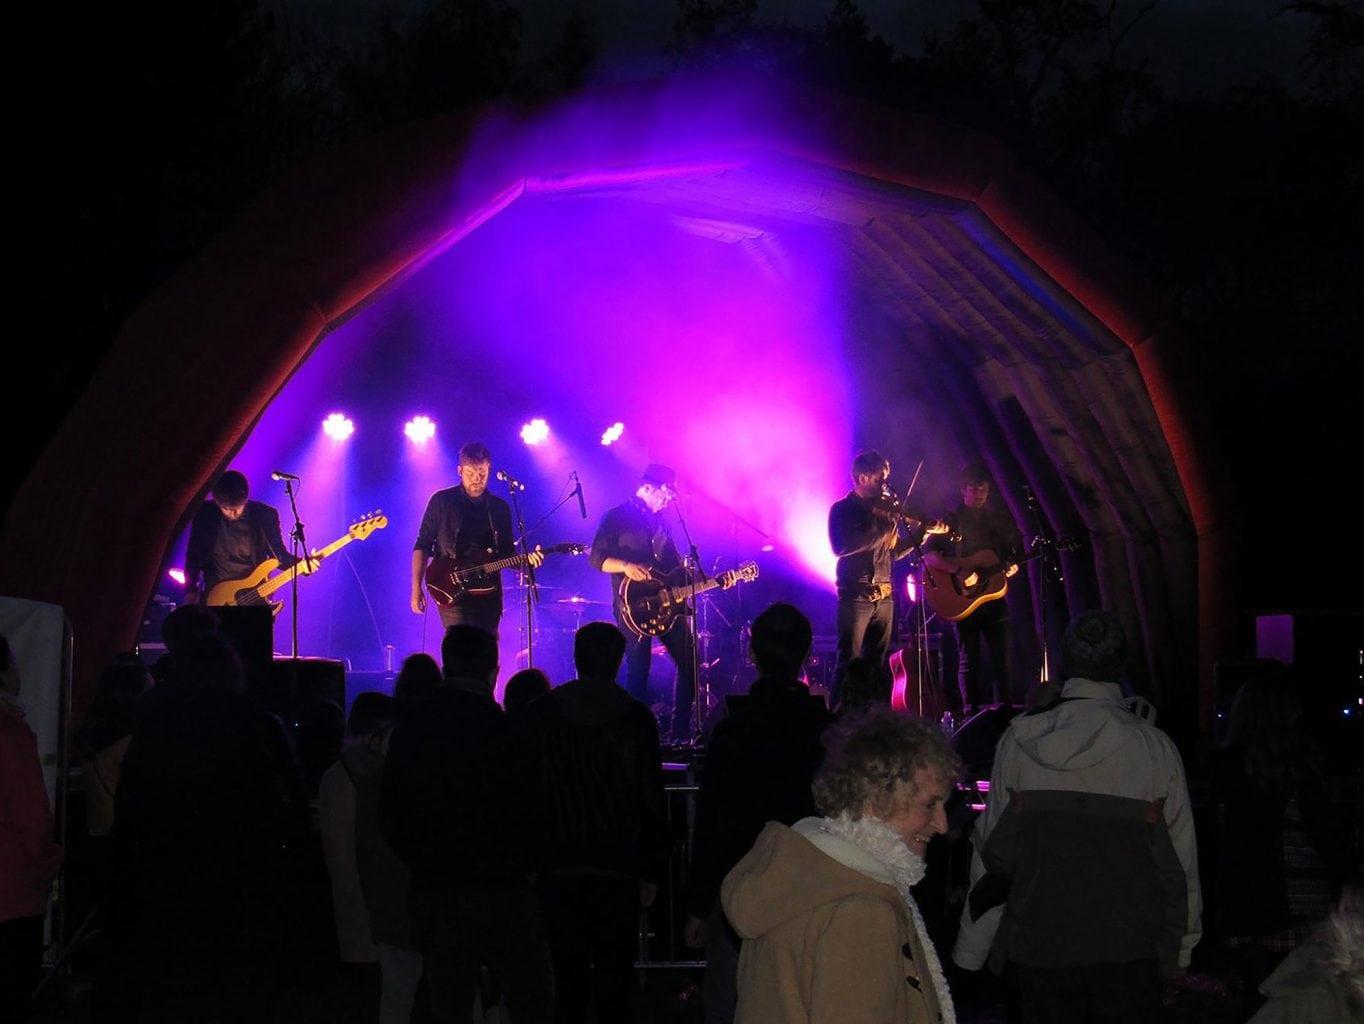 Music festival performance